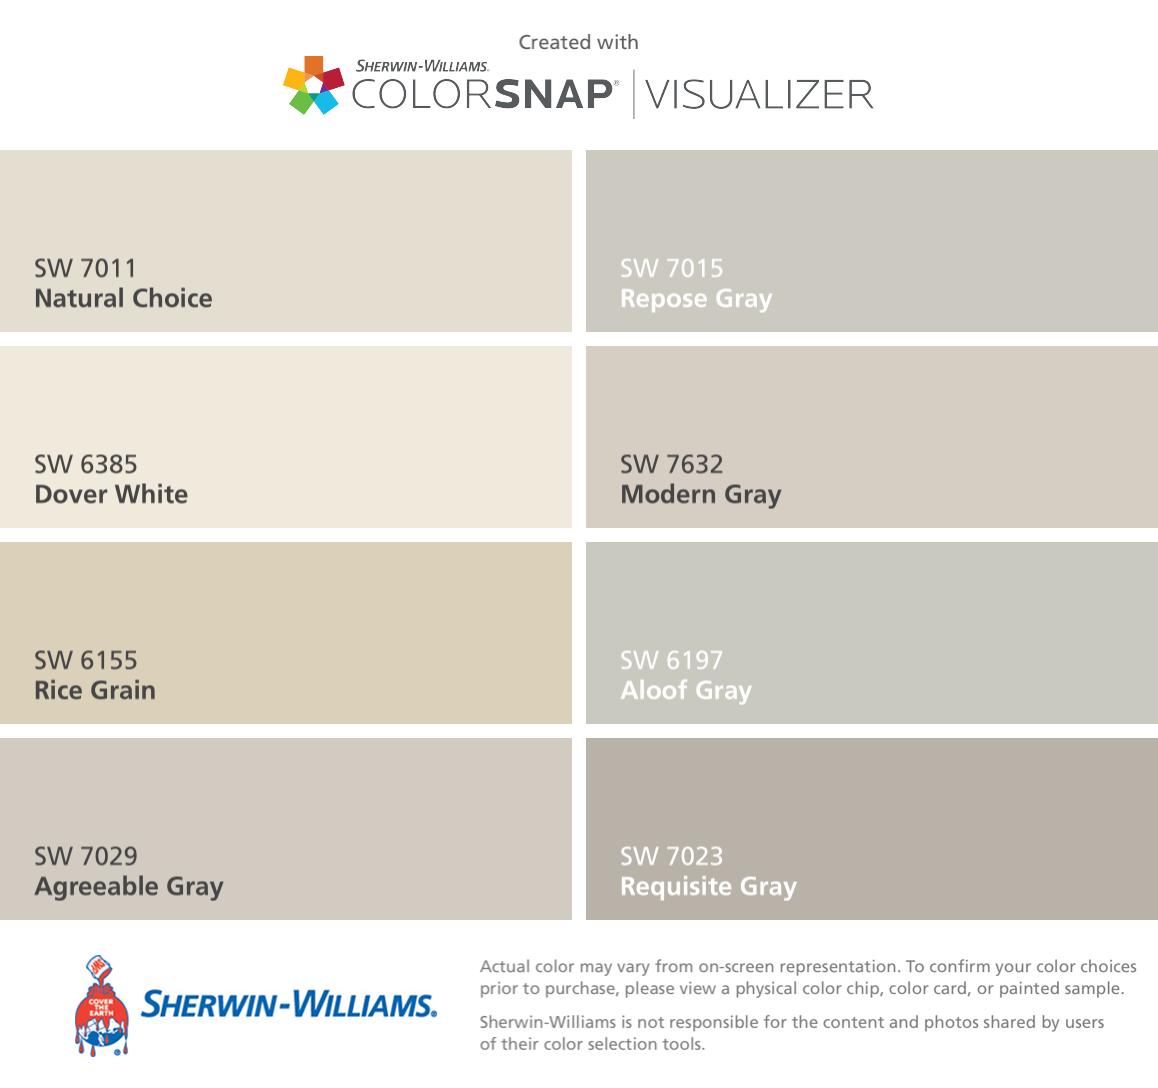 Ich Habe Diese Farben Mit Colorsnap Visualizer Für Iphone: Love These Classic Sherwin-Williams Neutrals For New Homes